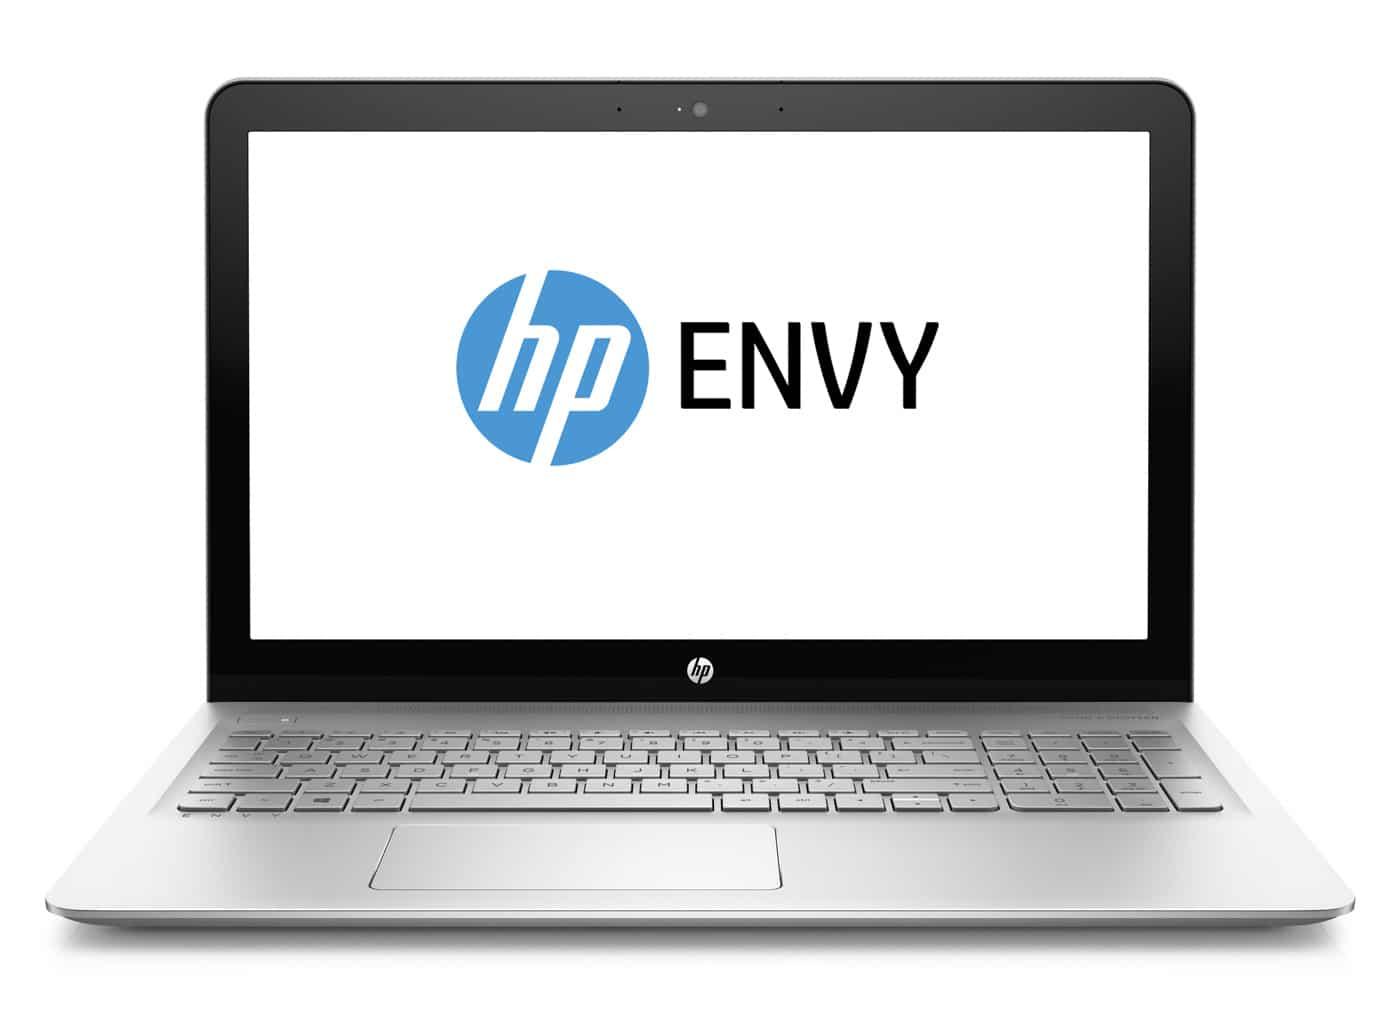 HP Envy 15-as001nf, ultrabook 15 pouces léger Core i7 8Go Iris Full IPS (749€)